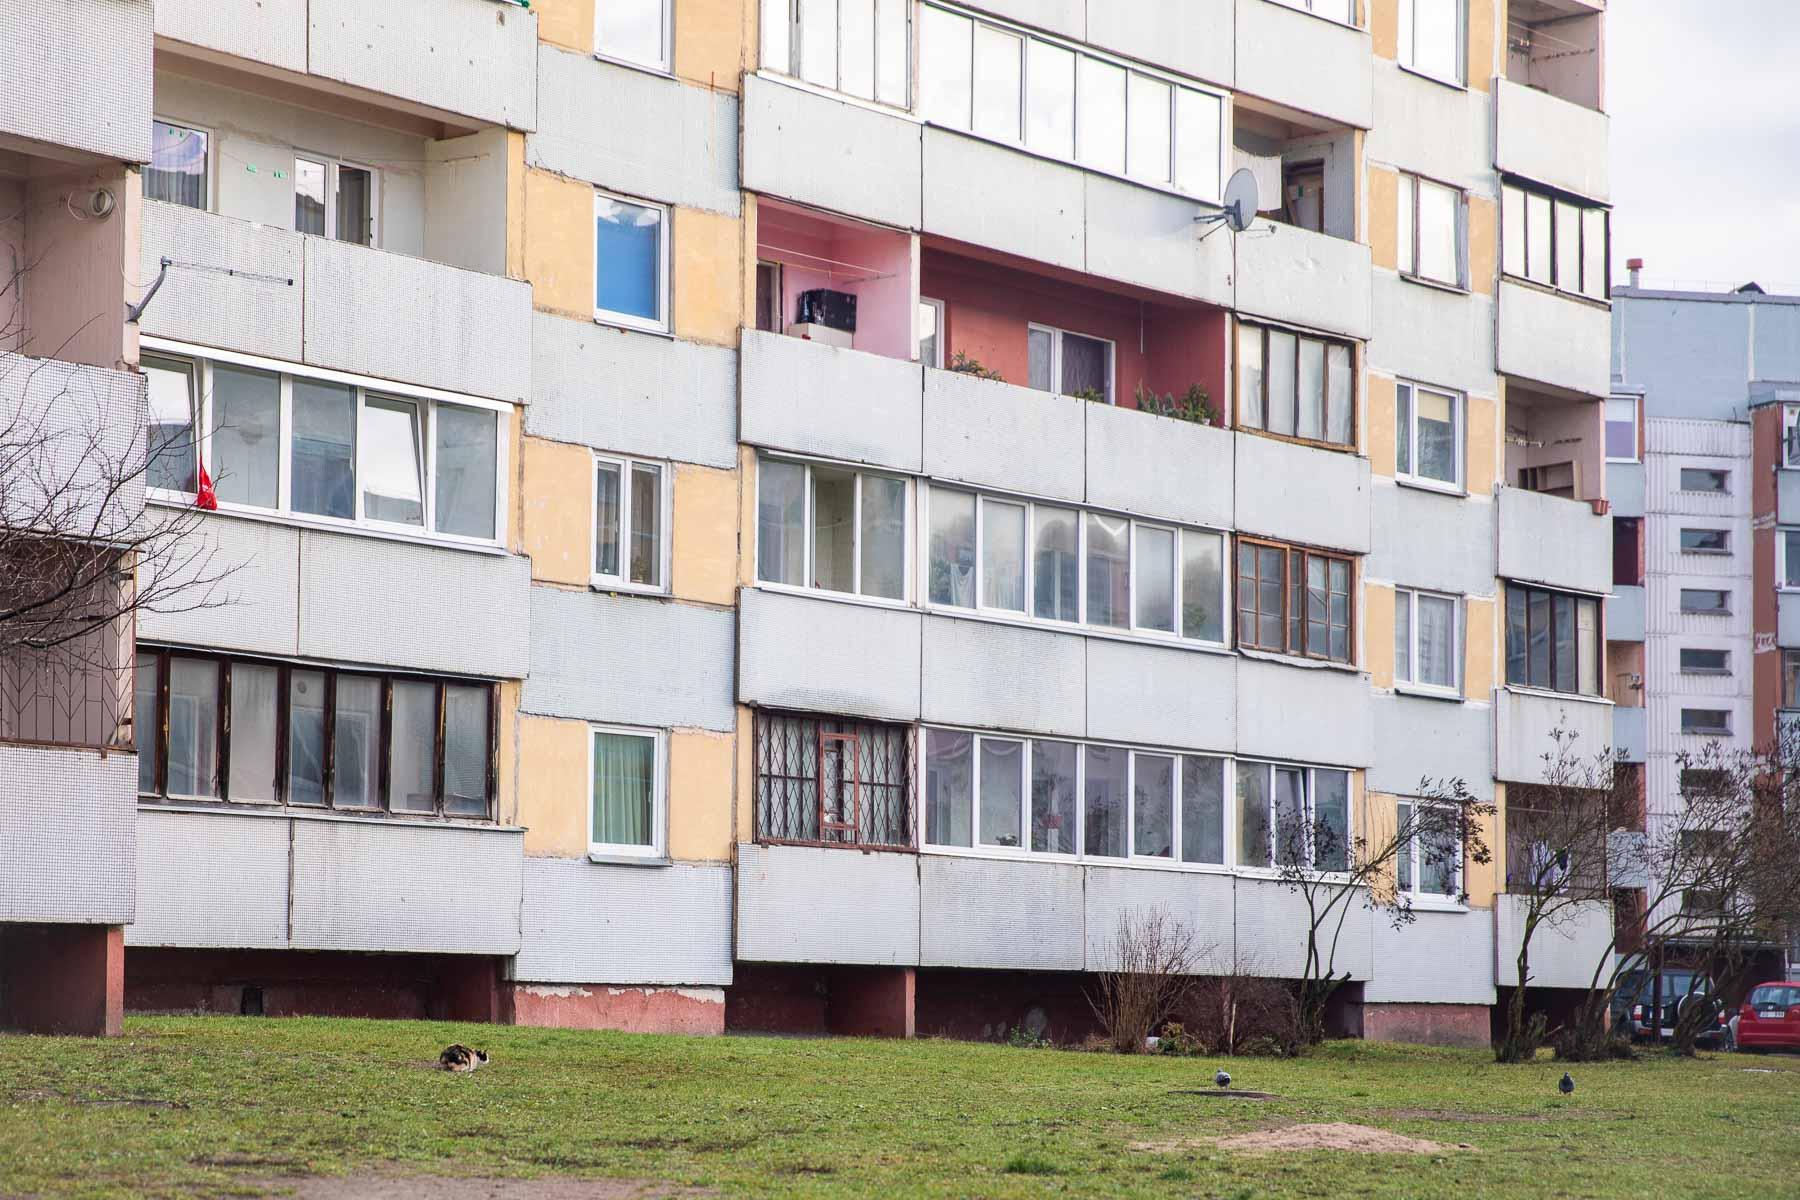 Landscape-cityscape-photography-jelgava-latvia-blocs-blocks-flat-post-soviet--Советские-квартиры-спальный-район-Латвия-город-фотограф-natalia-smith-photography-0014.jpg